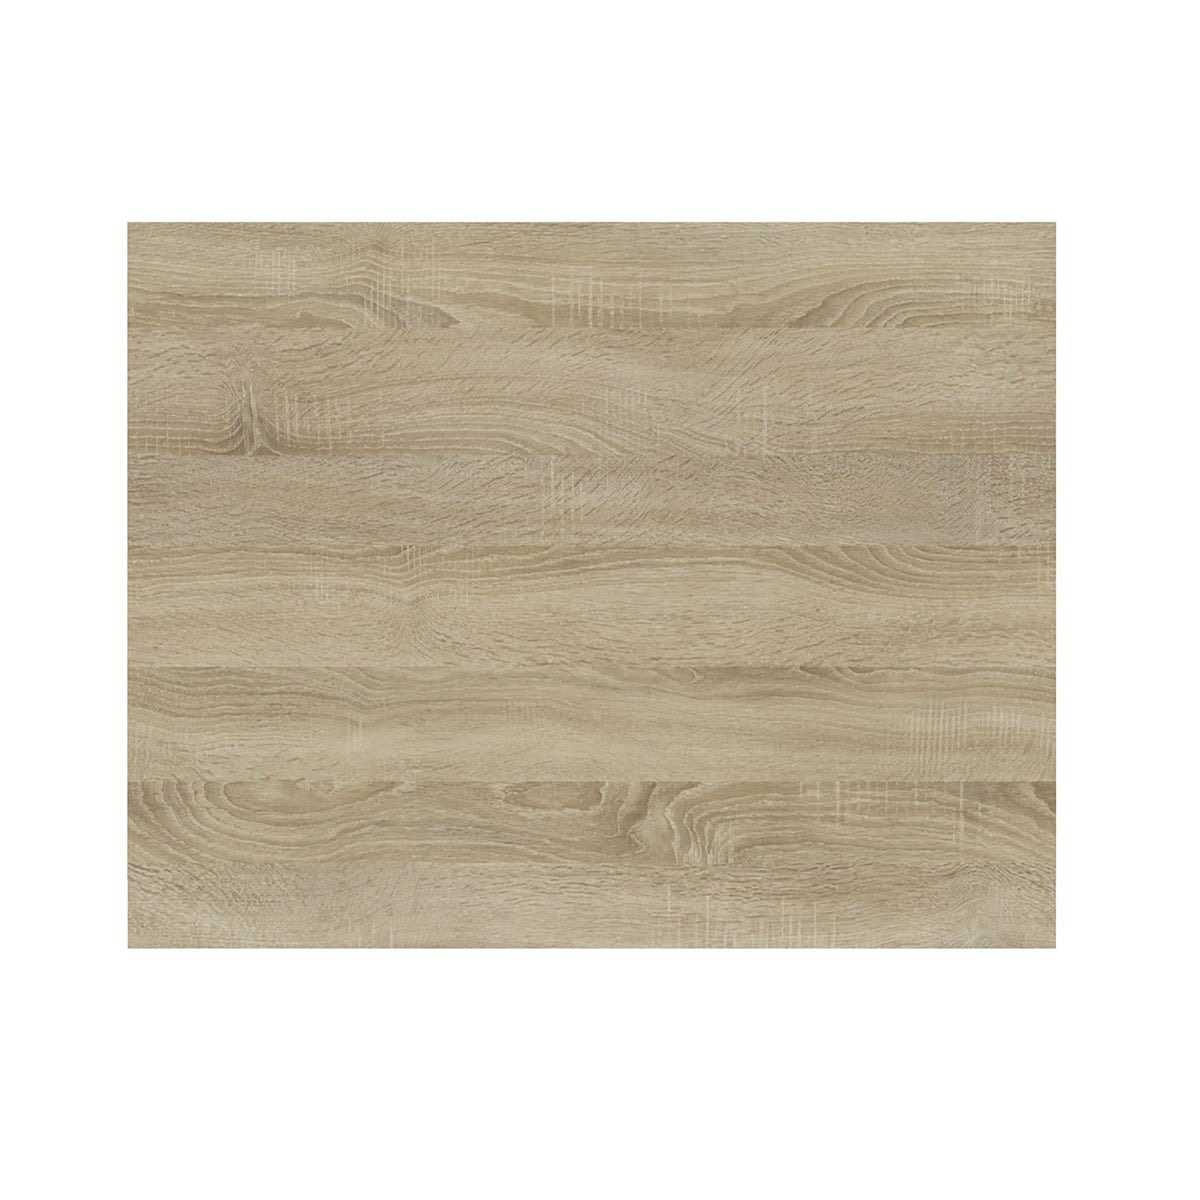 Orchard Wye oak shower bath end panel 680mm